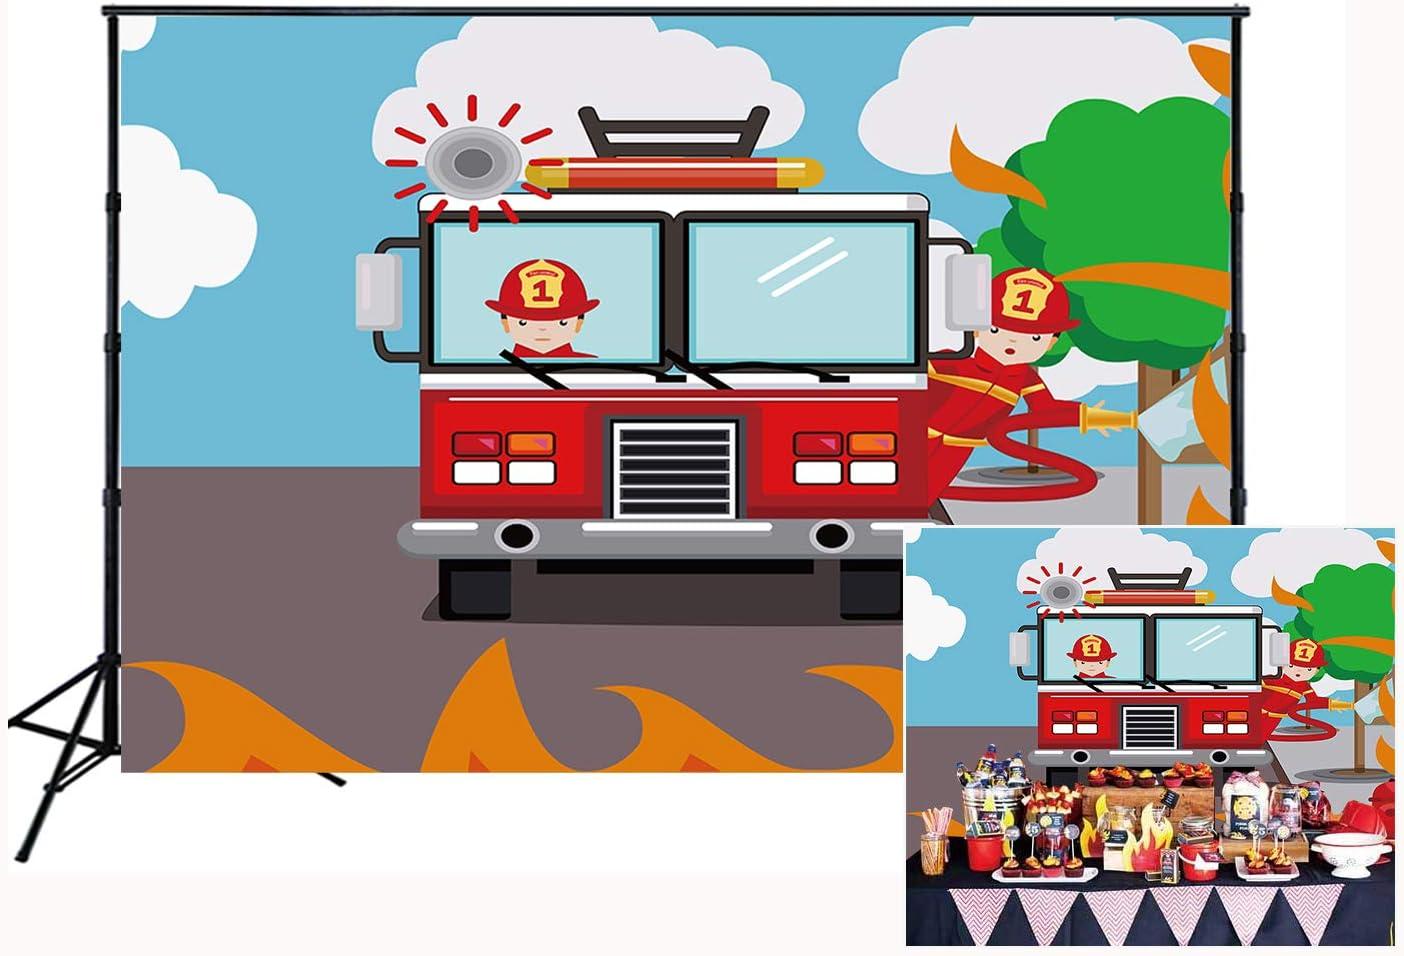 Fireman Party Banner Firestation Backdrop Fireman Photobooth Fireman DIGITAL FILE Fireman Banner Fireman Backdrop Firefighter Backdrop